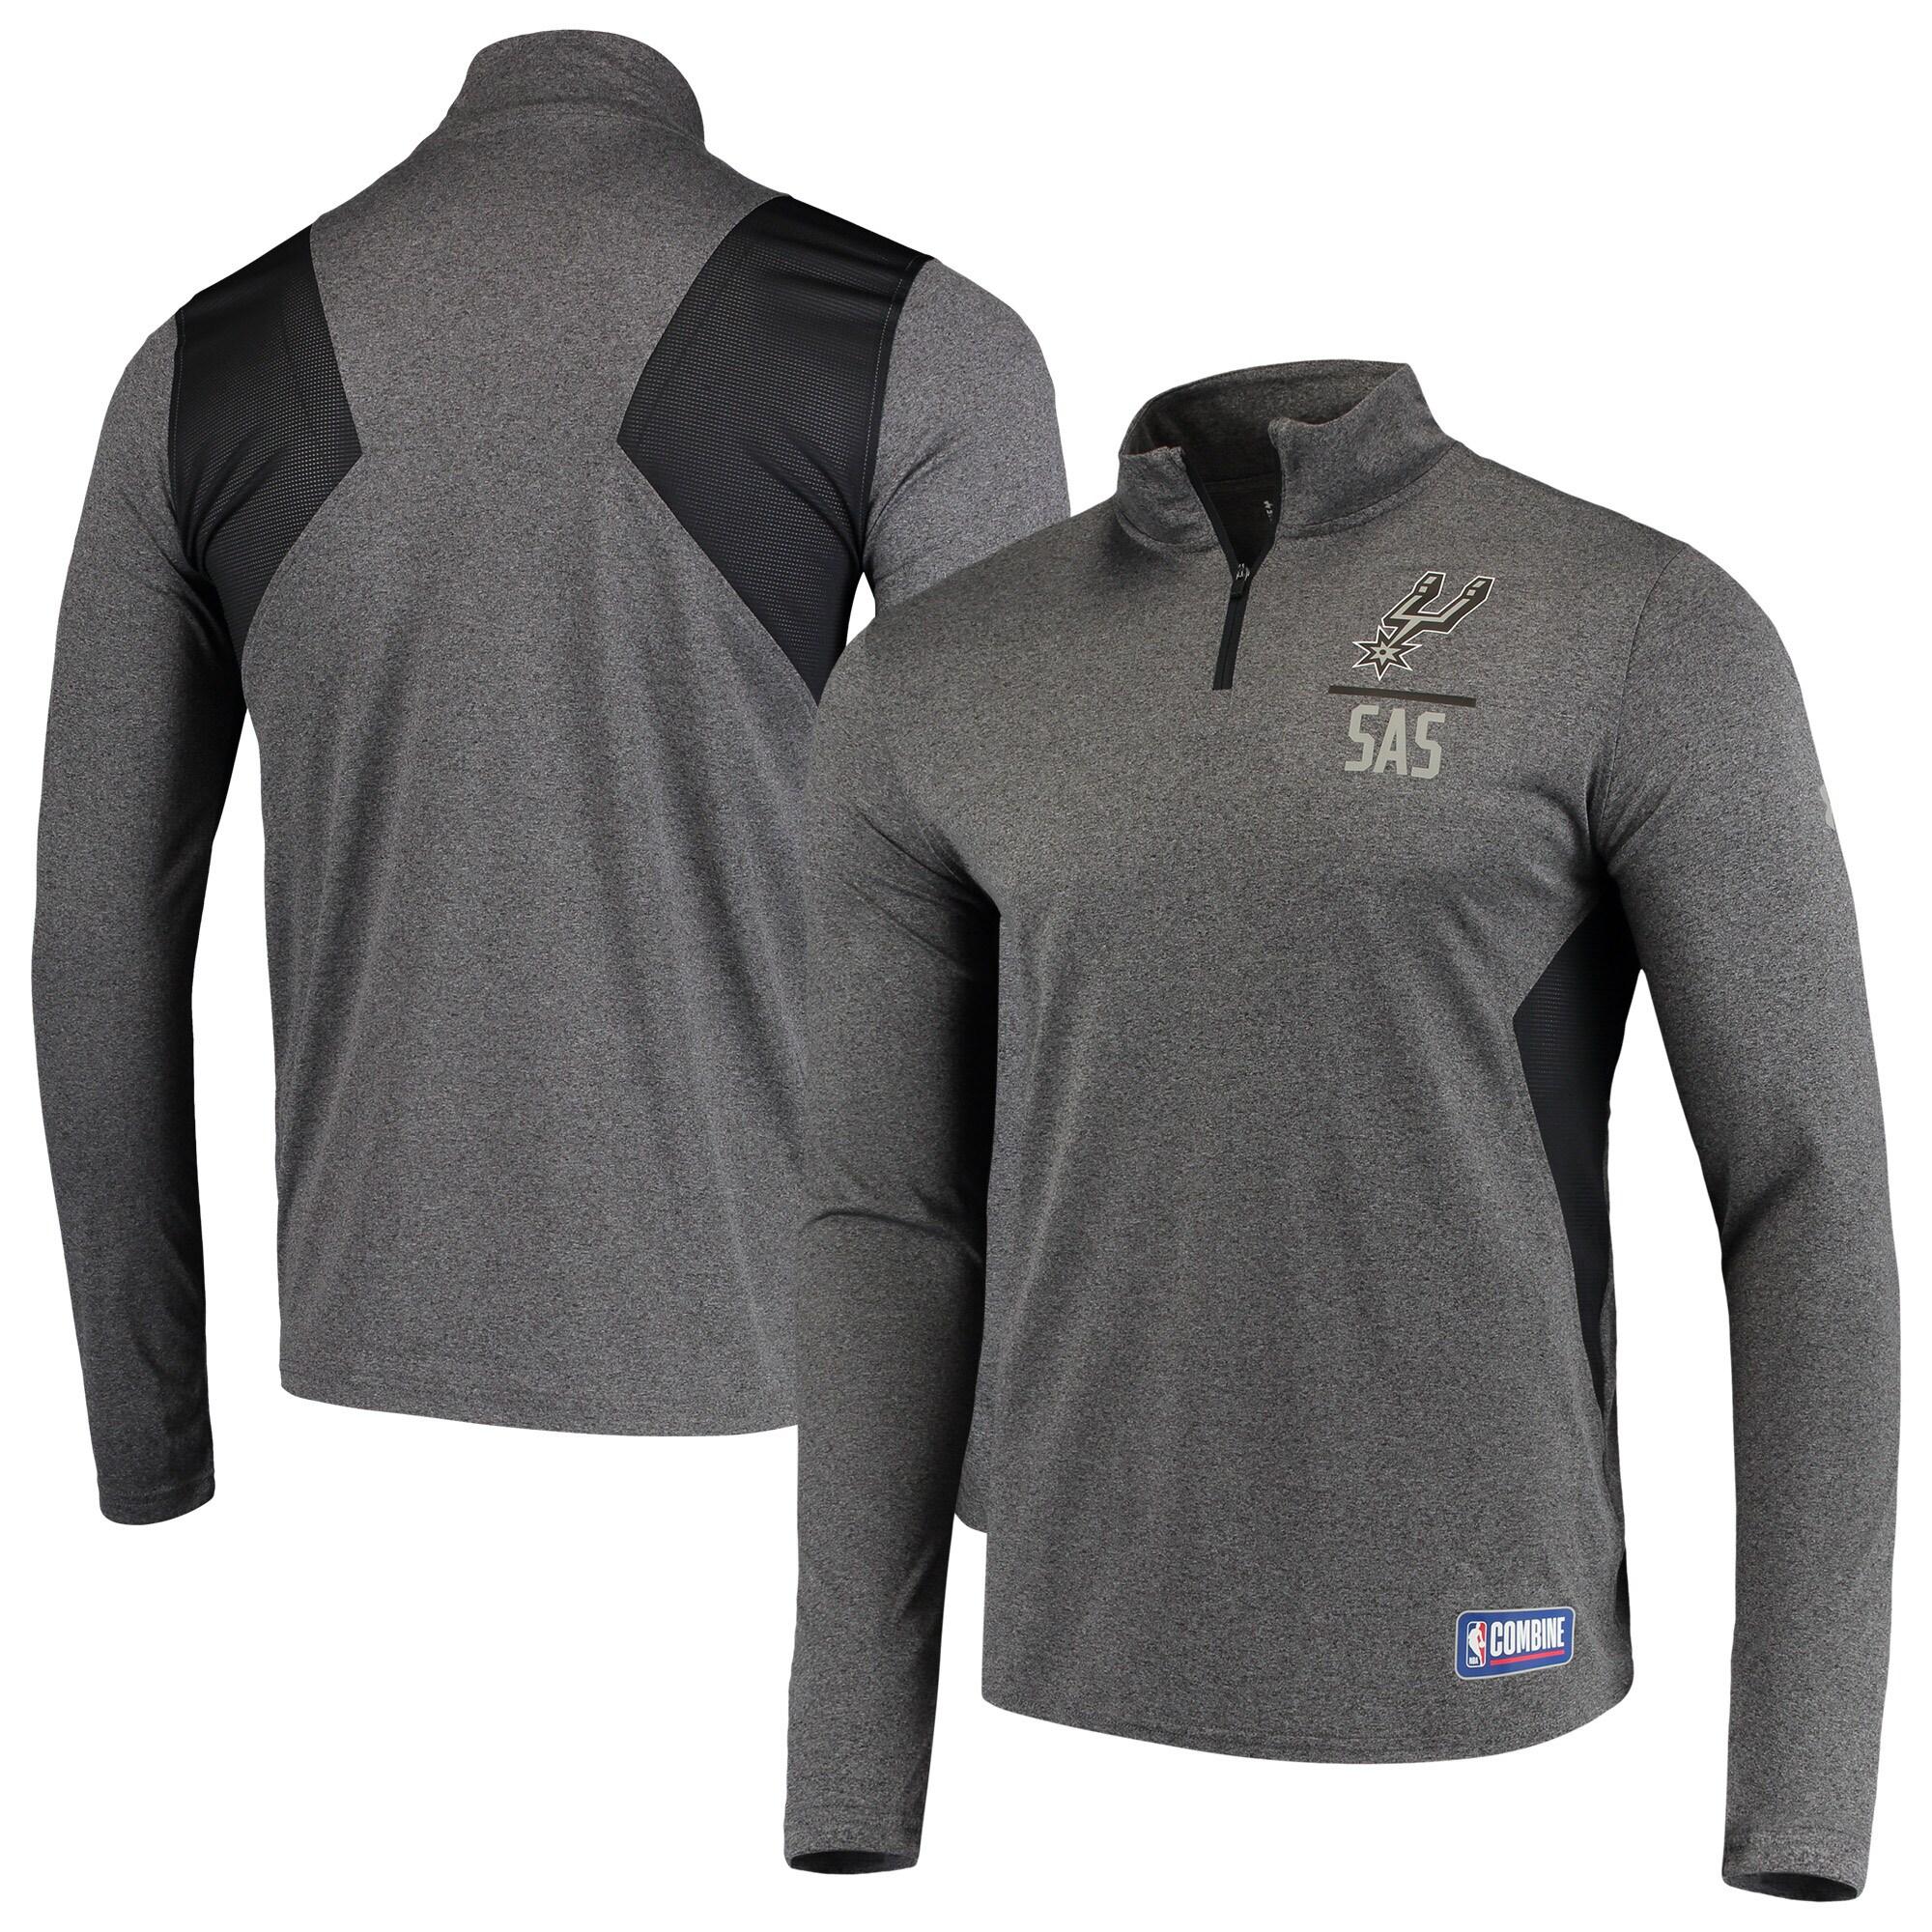 San Antonio Spurs Under Armour Combine Authentic Season Tech Quarter-Zip Pullover Jacket - Heathered Charcoal